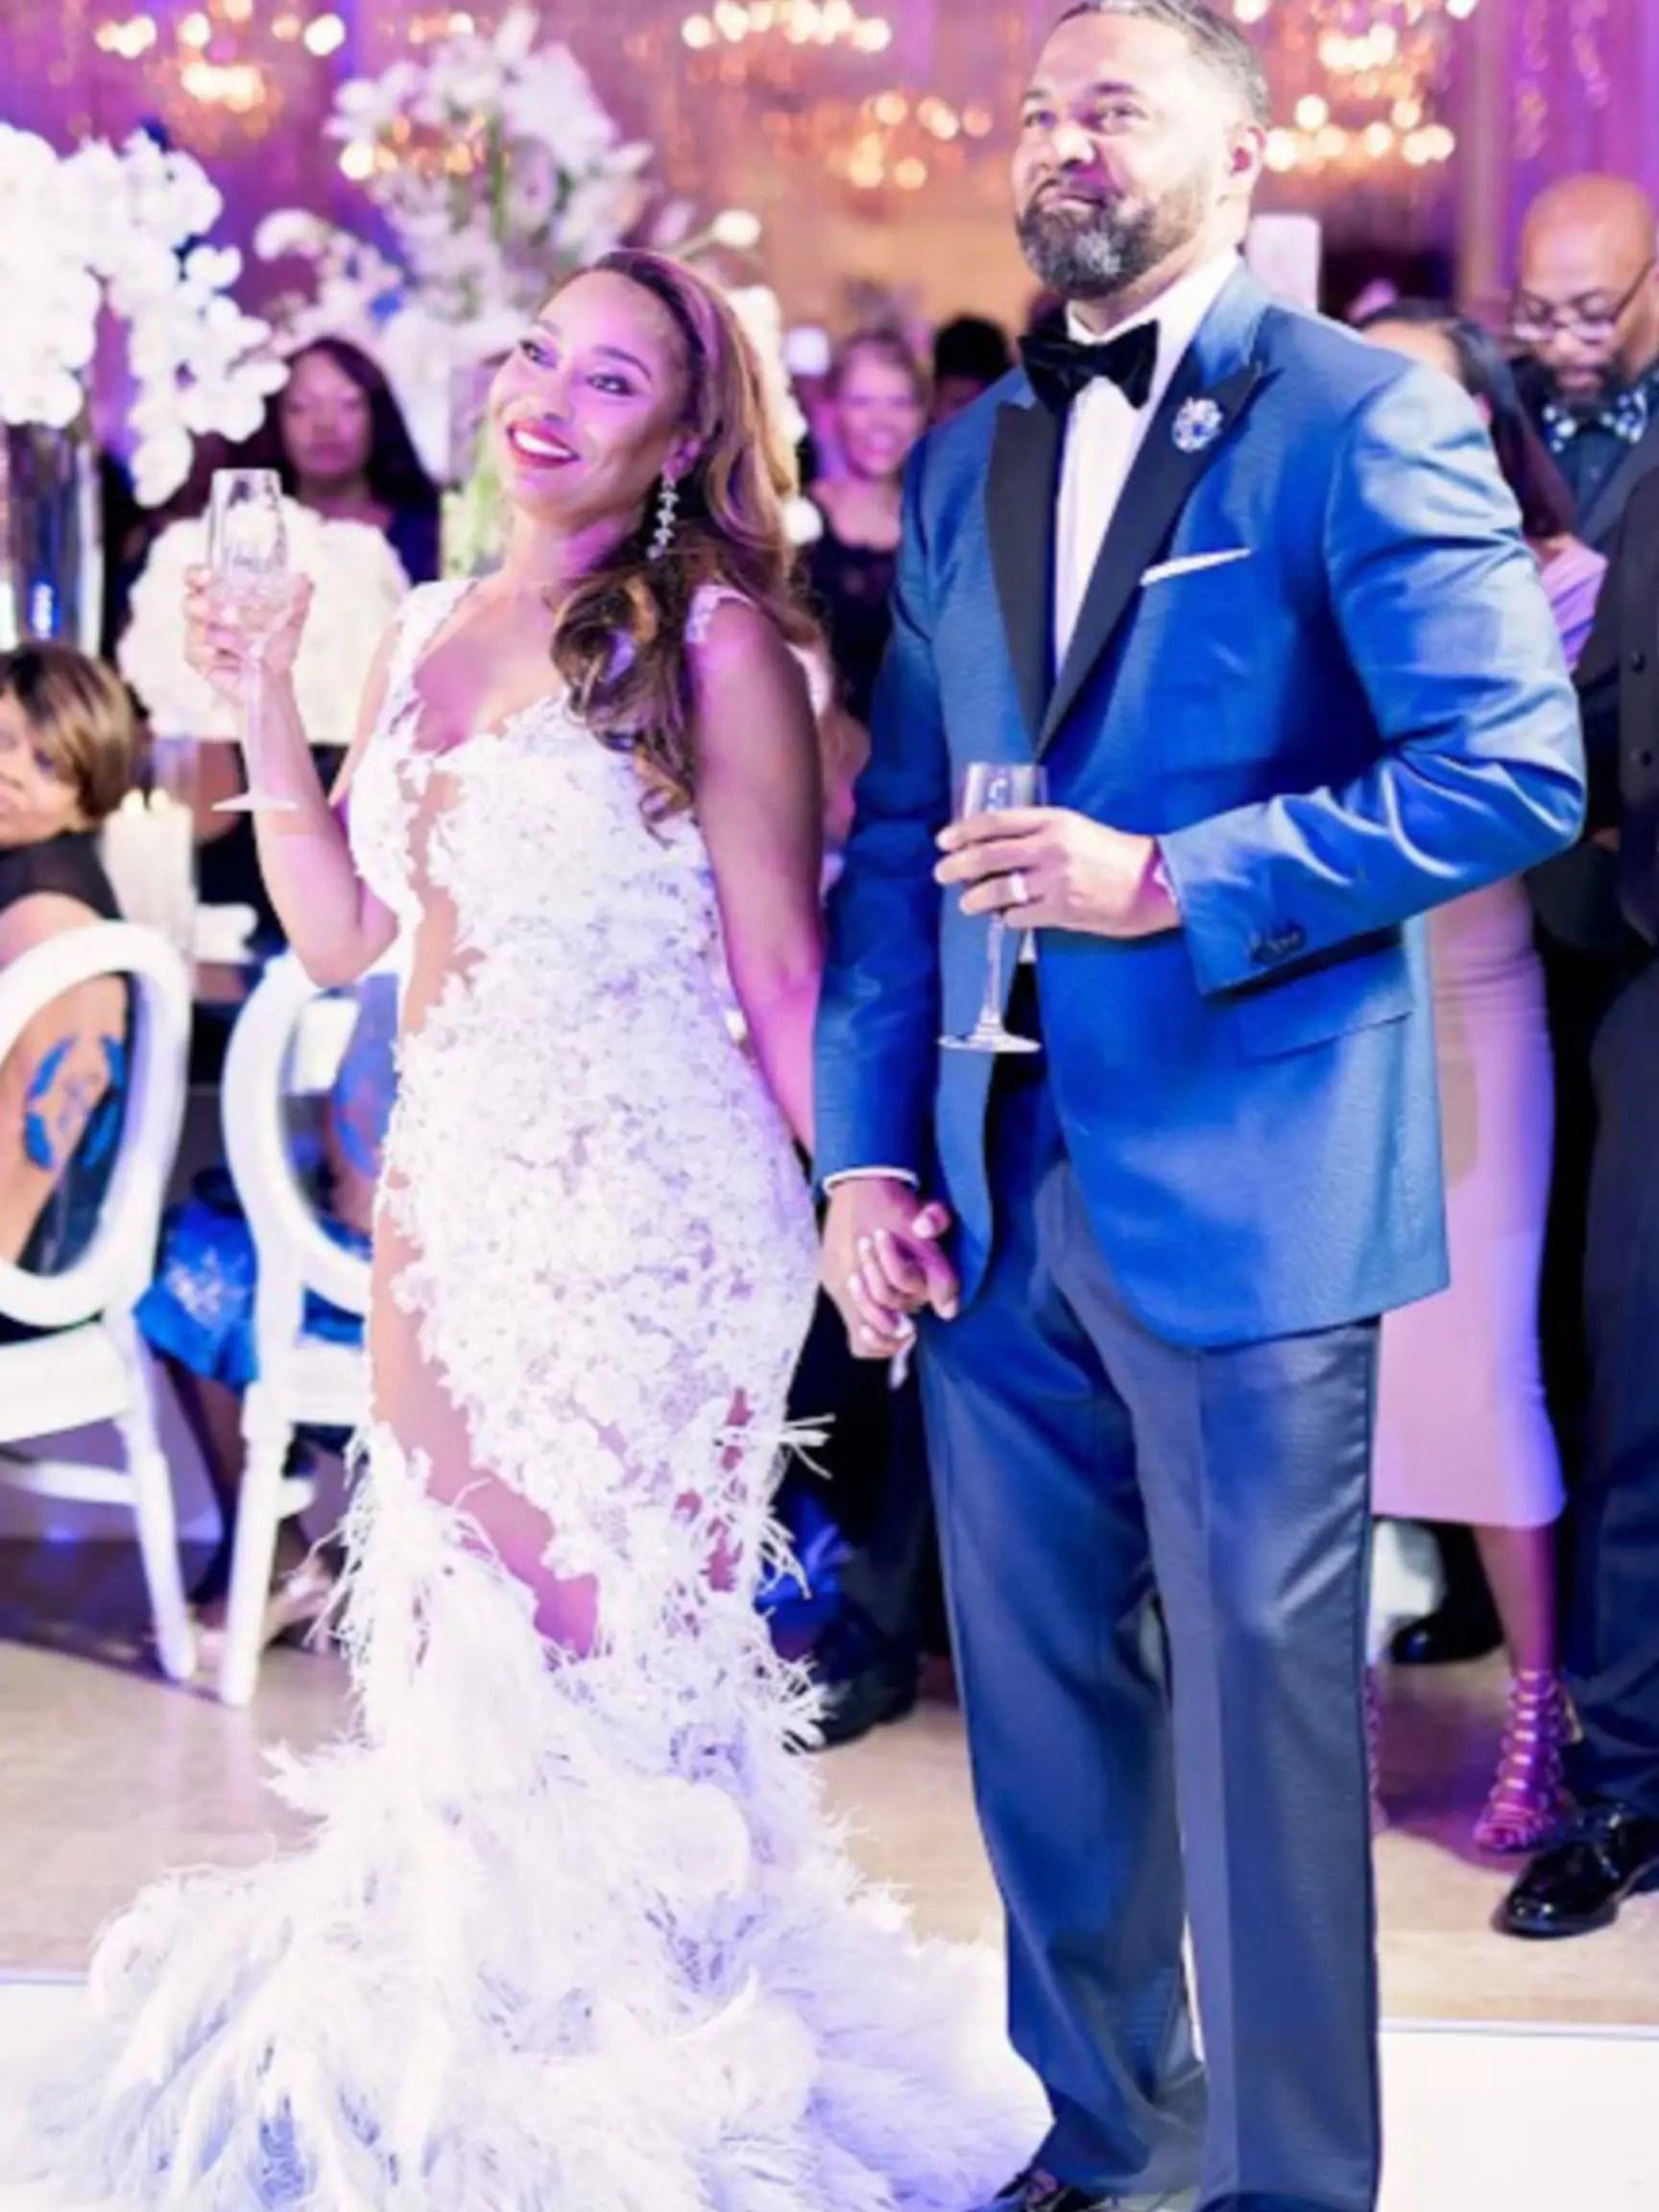 custom wedding tuxedo